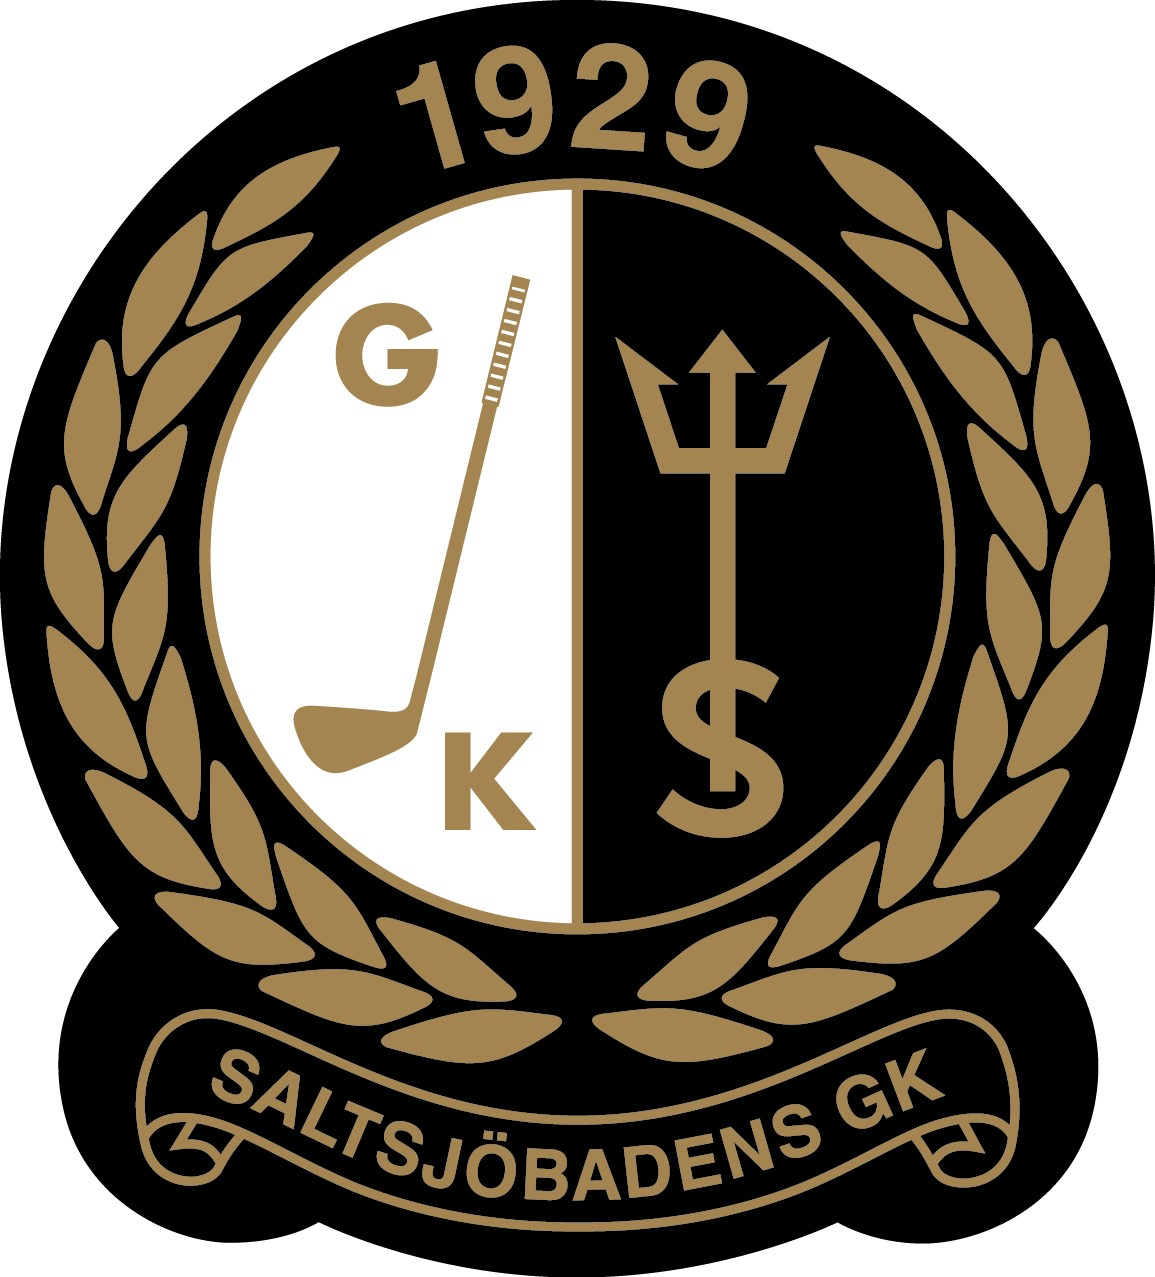 Saltsjöbadens Golfklubbs Vårmöte 2021